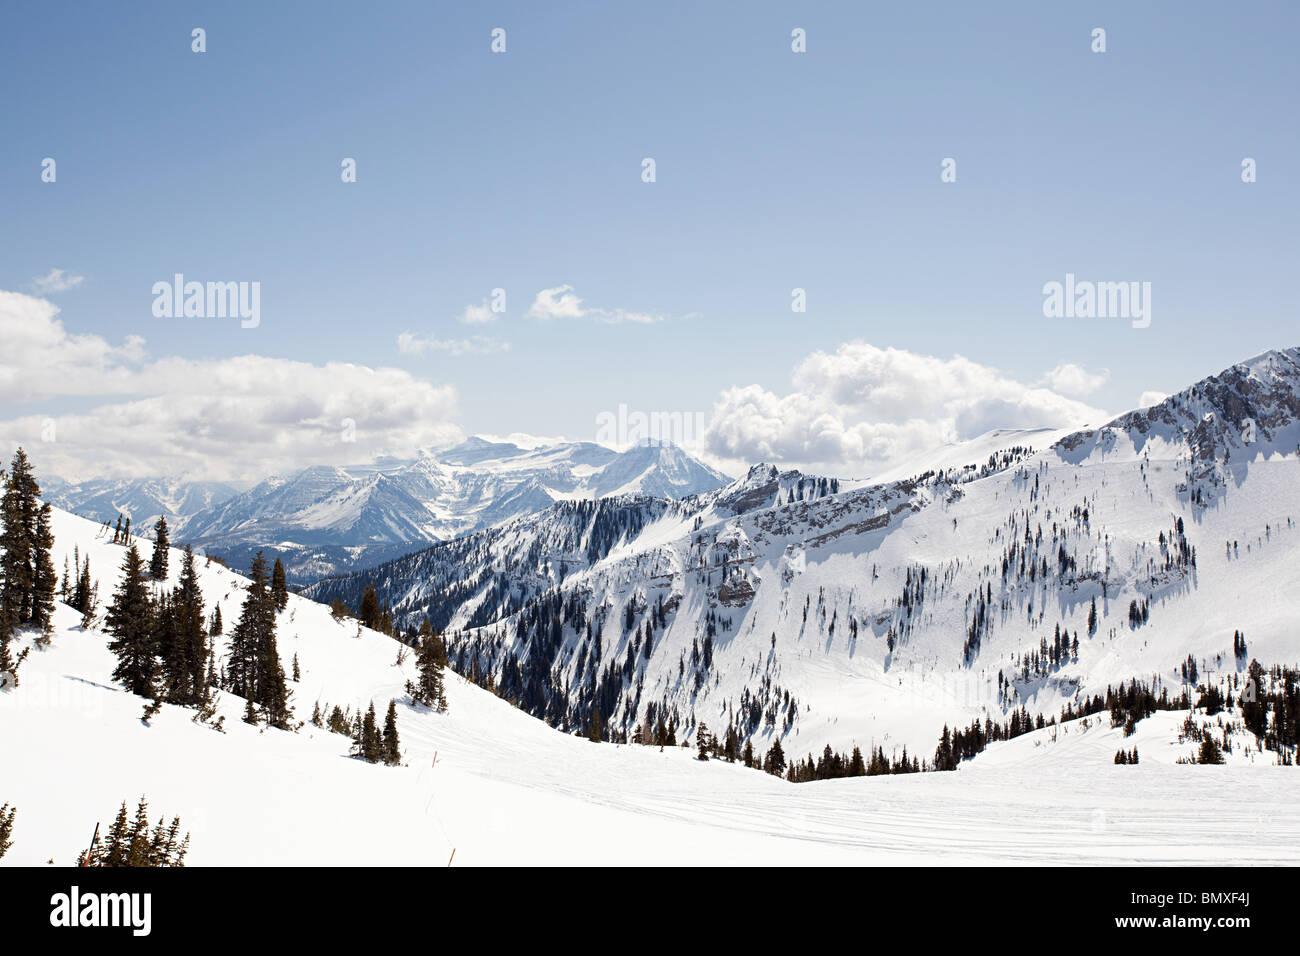 Ski resort nello Utah Stati Uniti d'America Immagini Stock